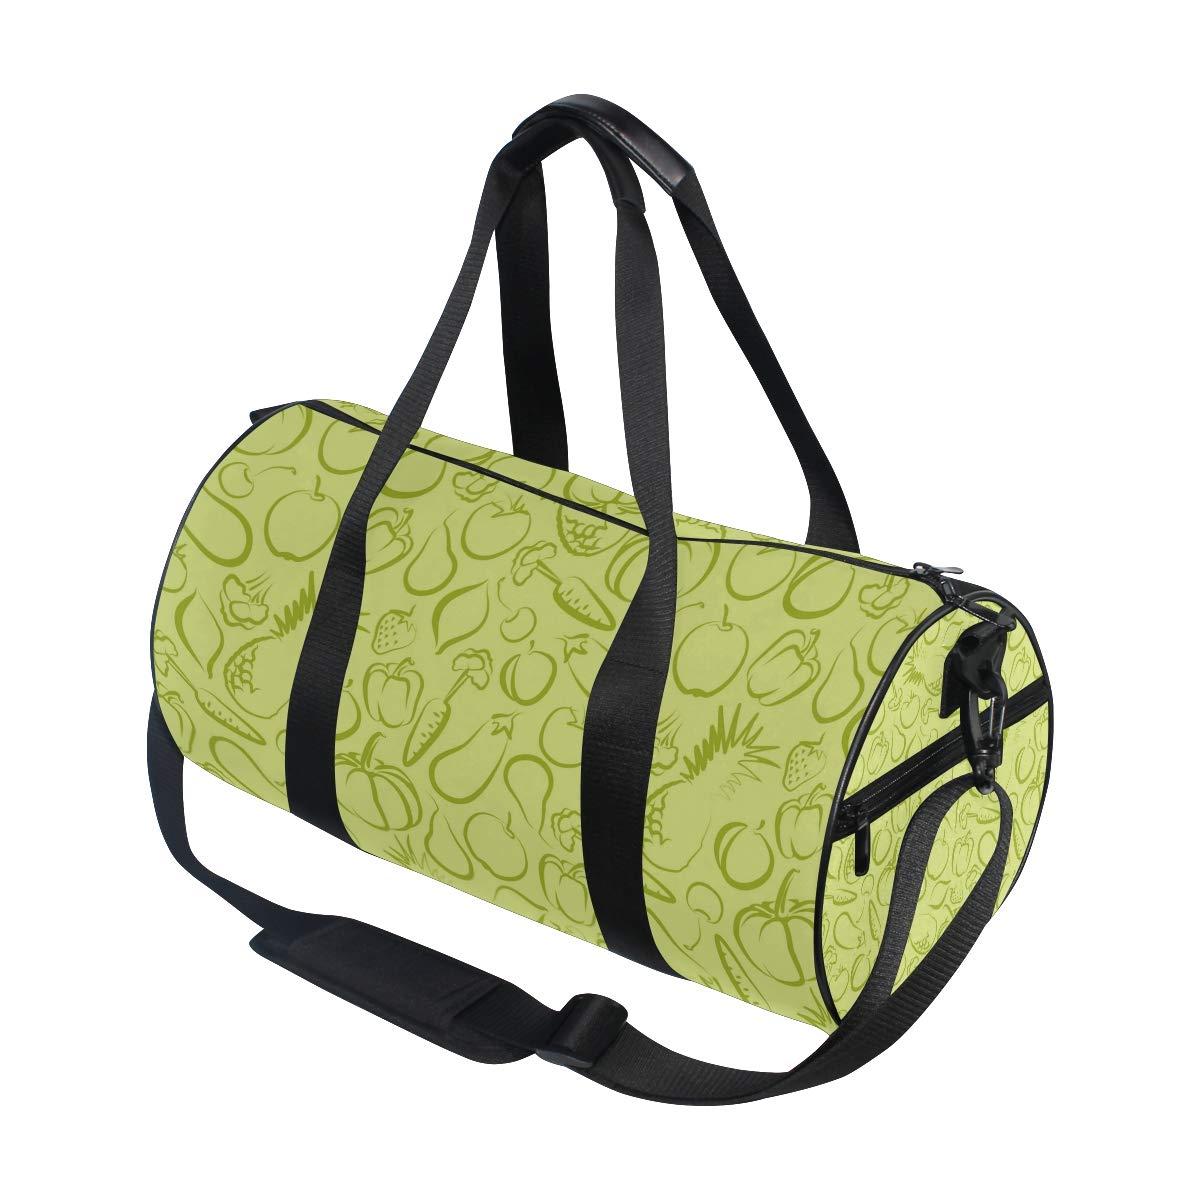 Waterproof Non-Slip Wearable Crossbody Bag fitness bag Shoulder Bag Vegetable Doll Picture